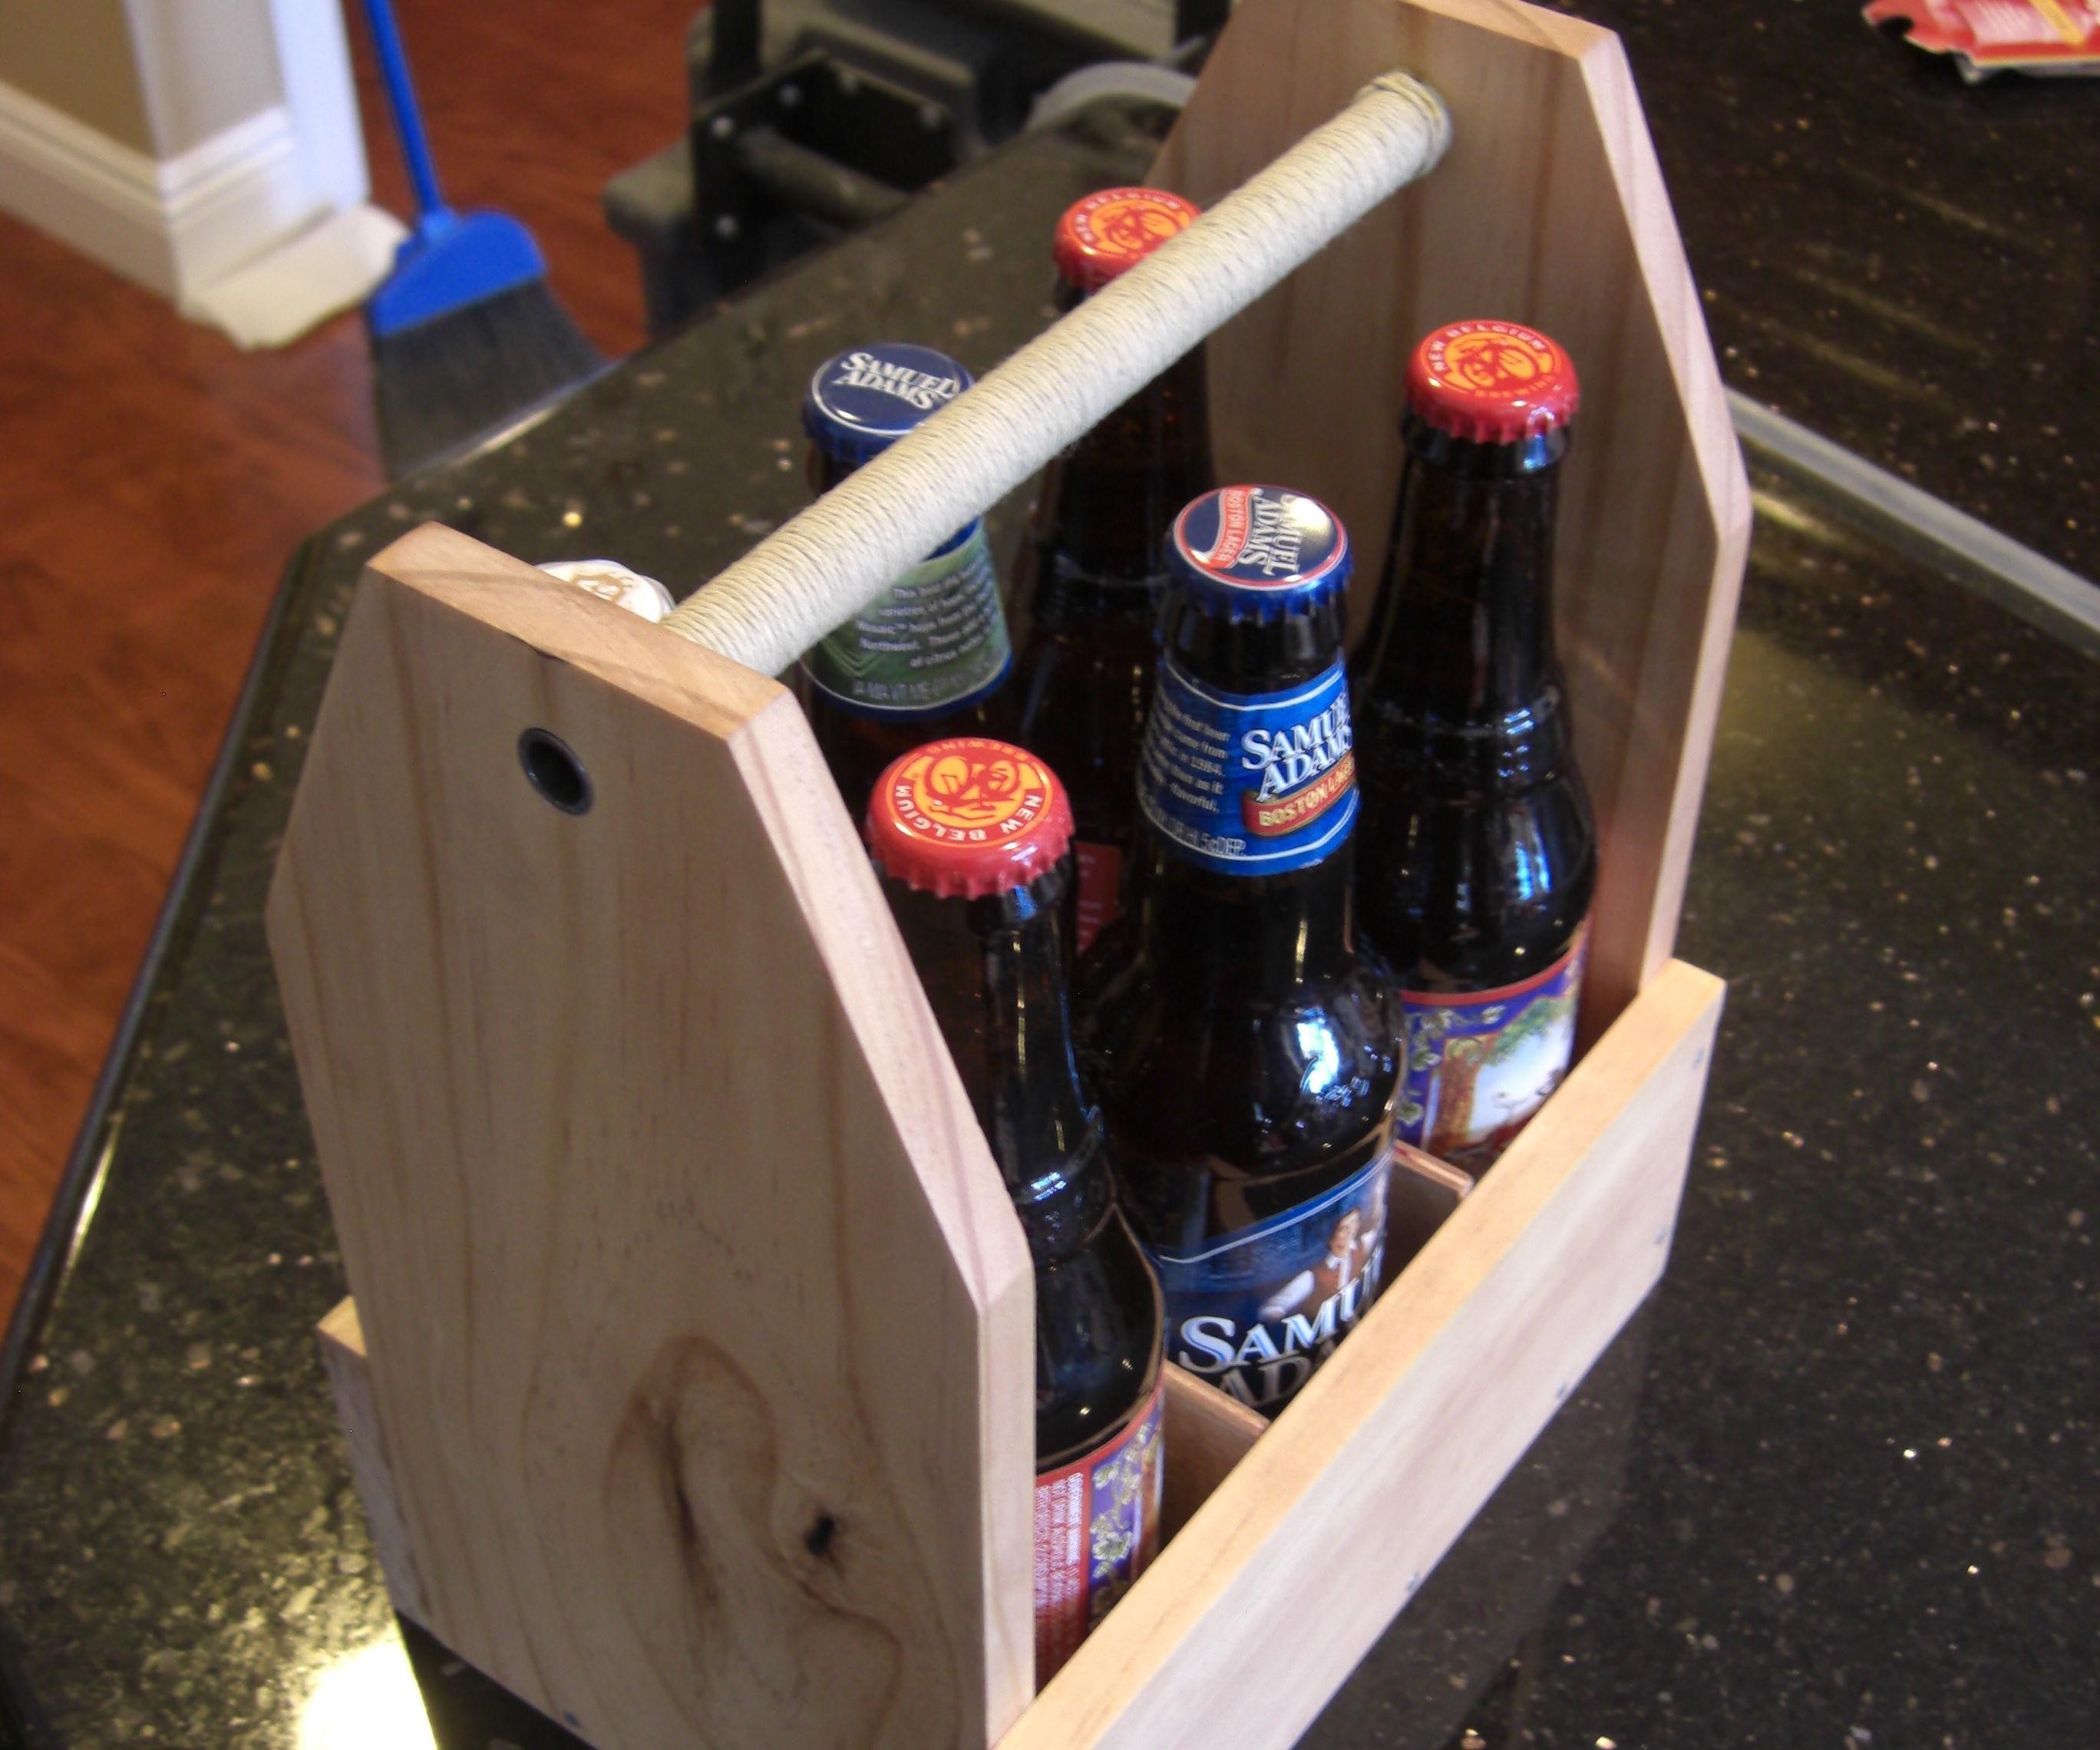 Wooden 6 Pack Holder